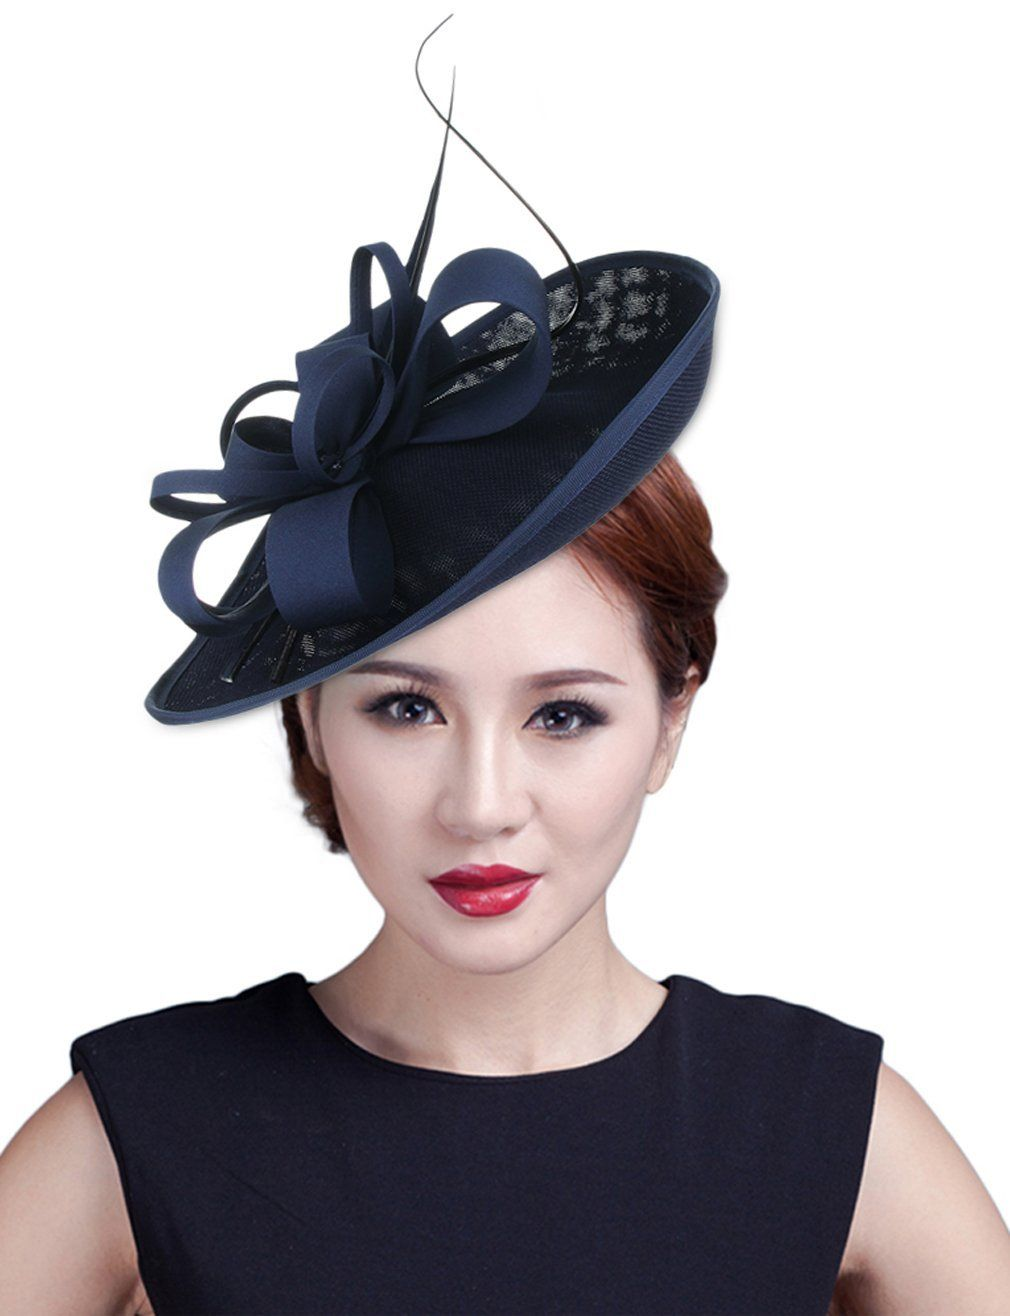 Full Wedding headdress a la vogue queen photos